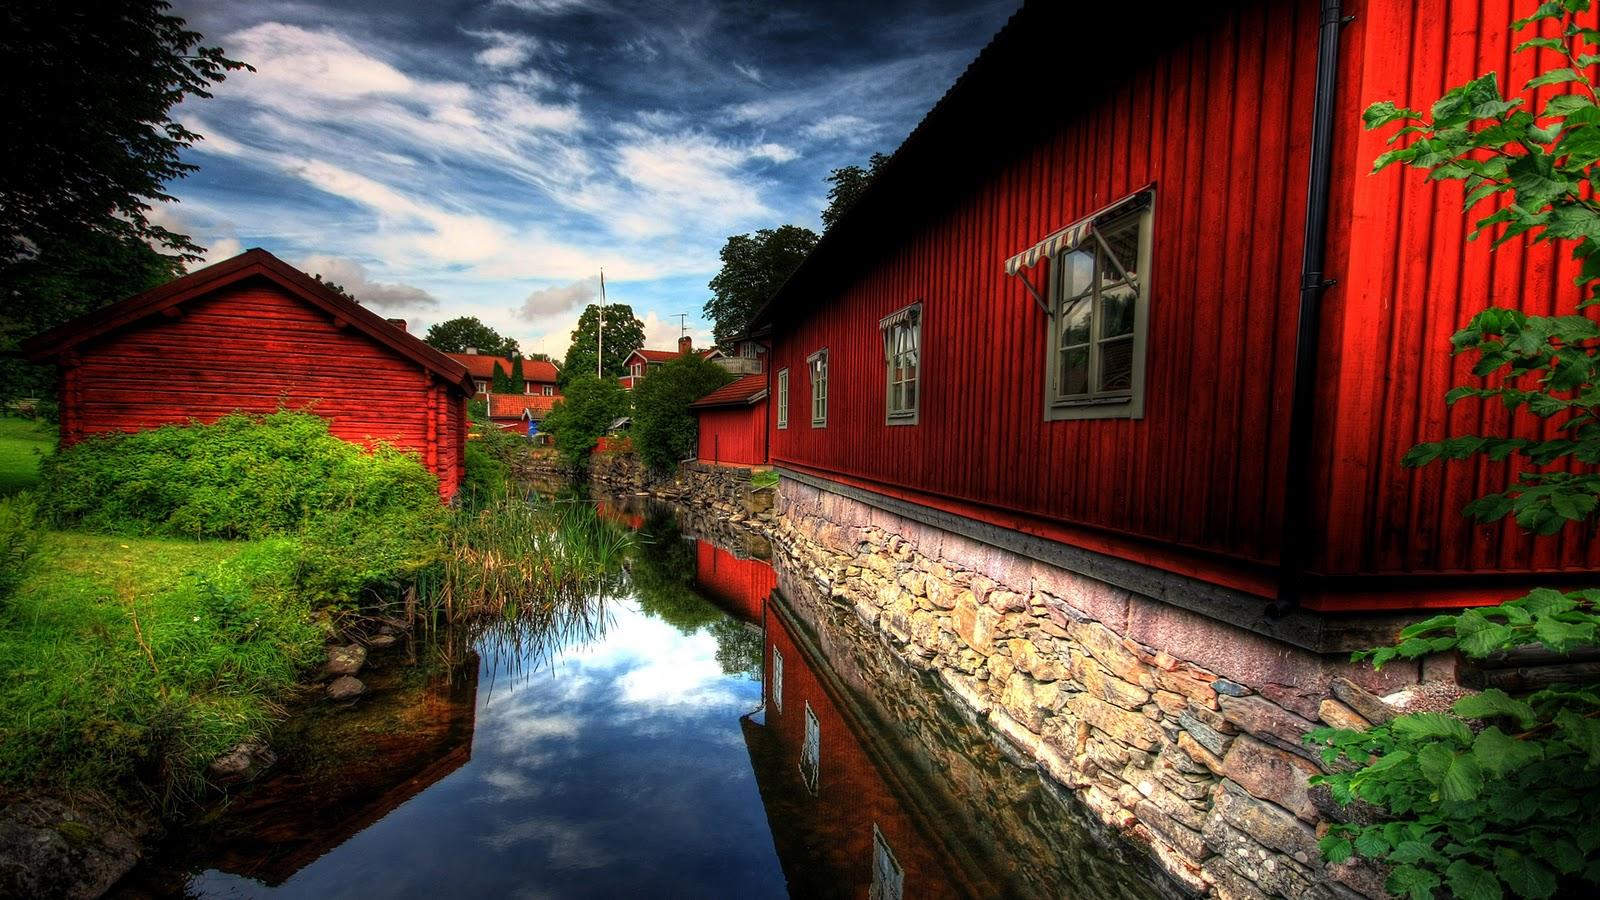 44 tane 1080p HD Manzara resimleri - 1080p HD Nature Wallpapers, HD Wallpapers   Rooteto